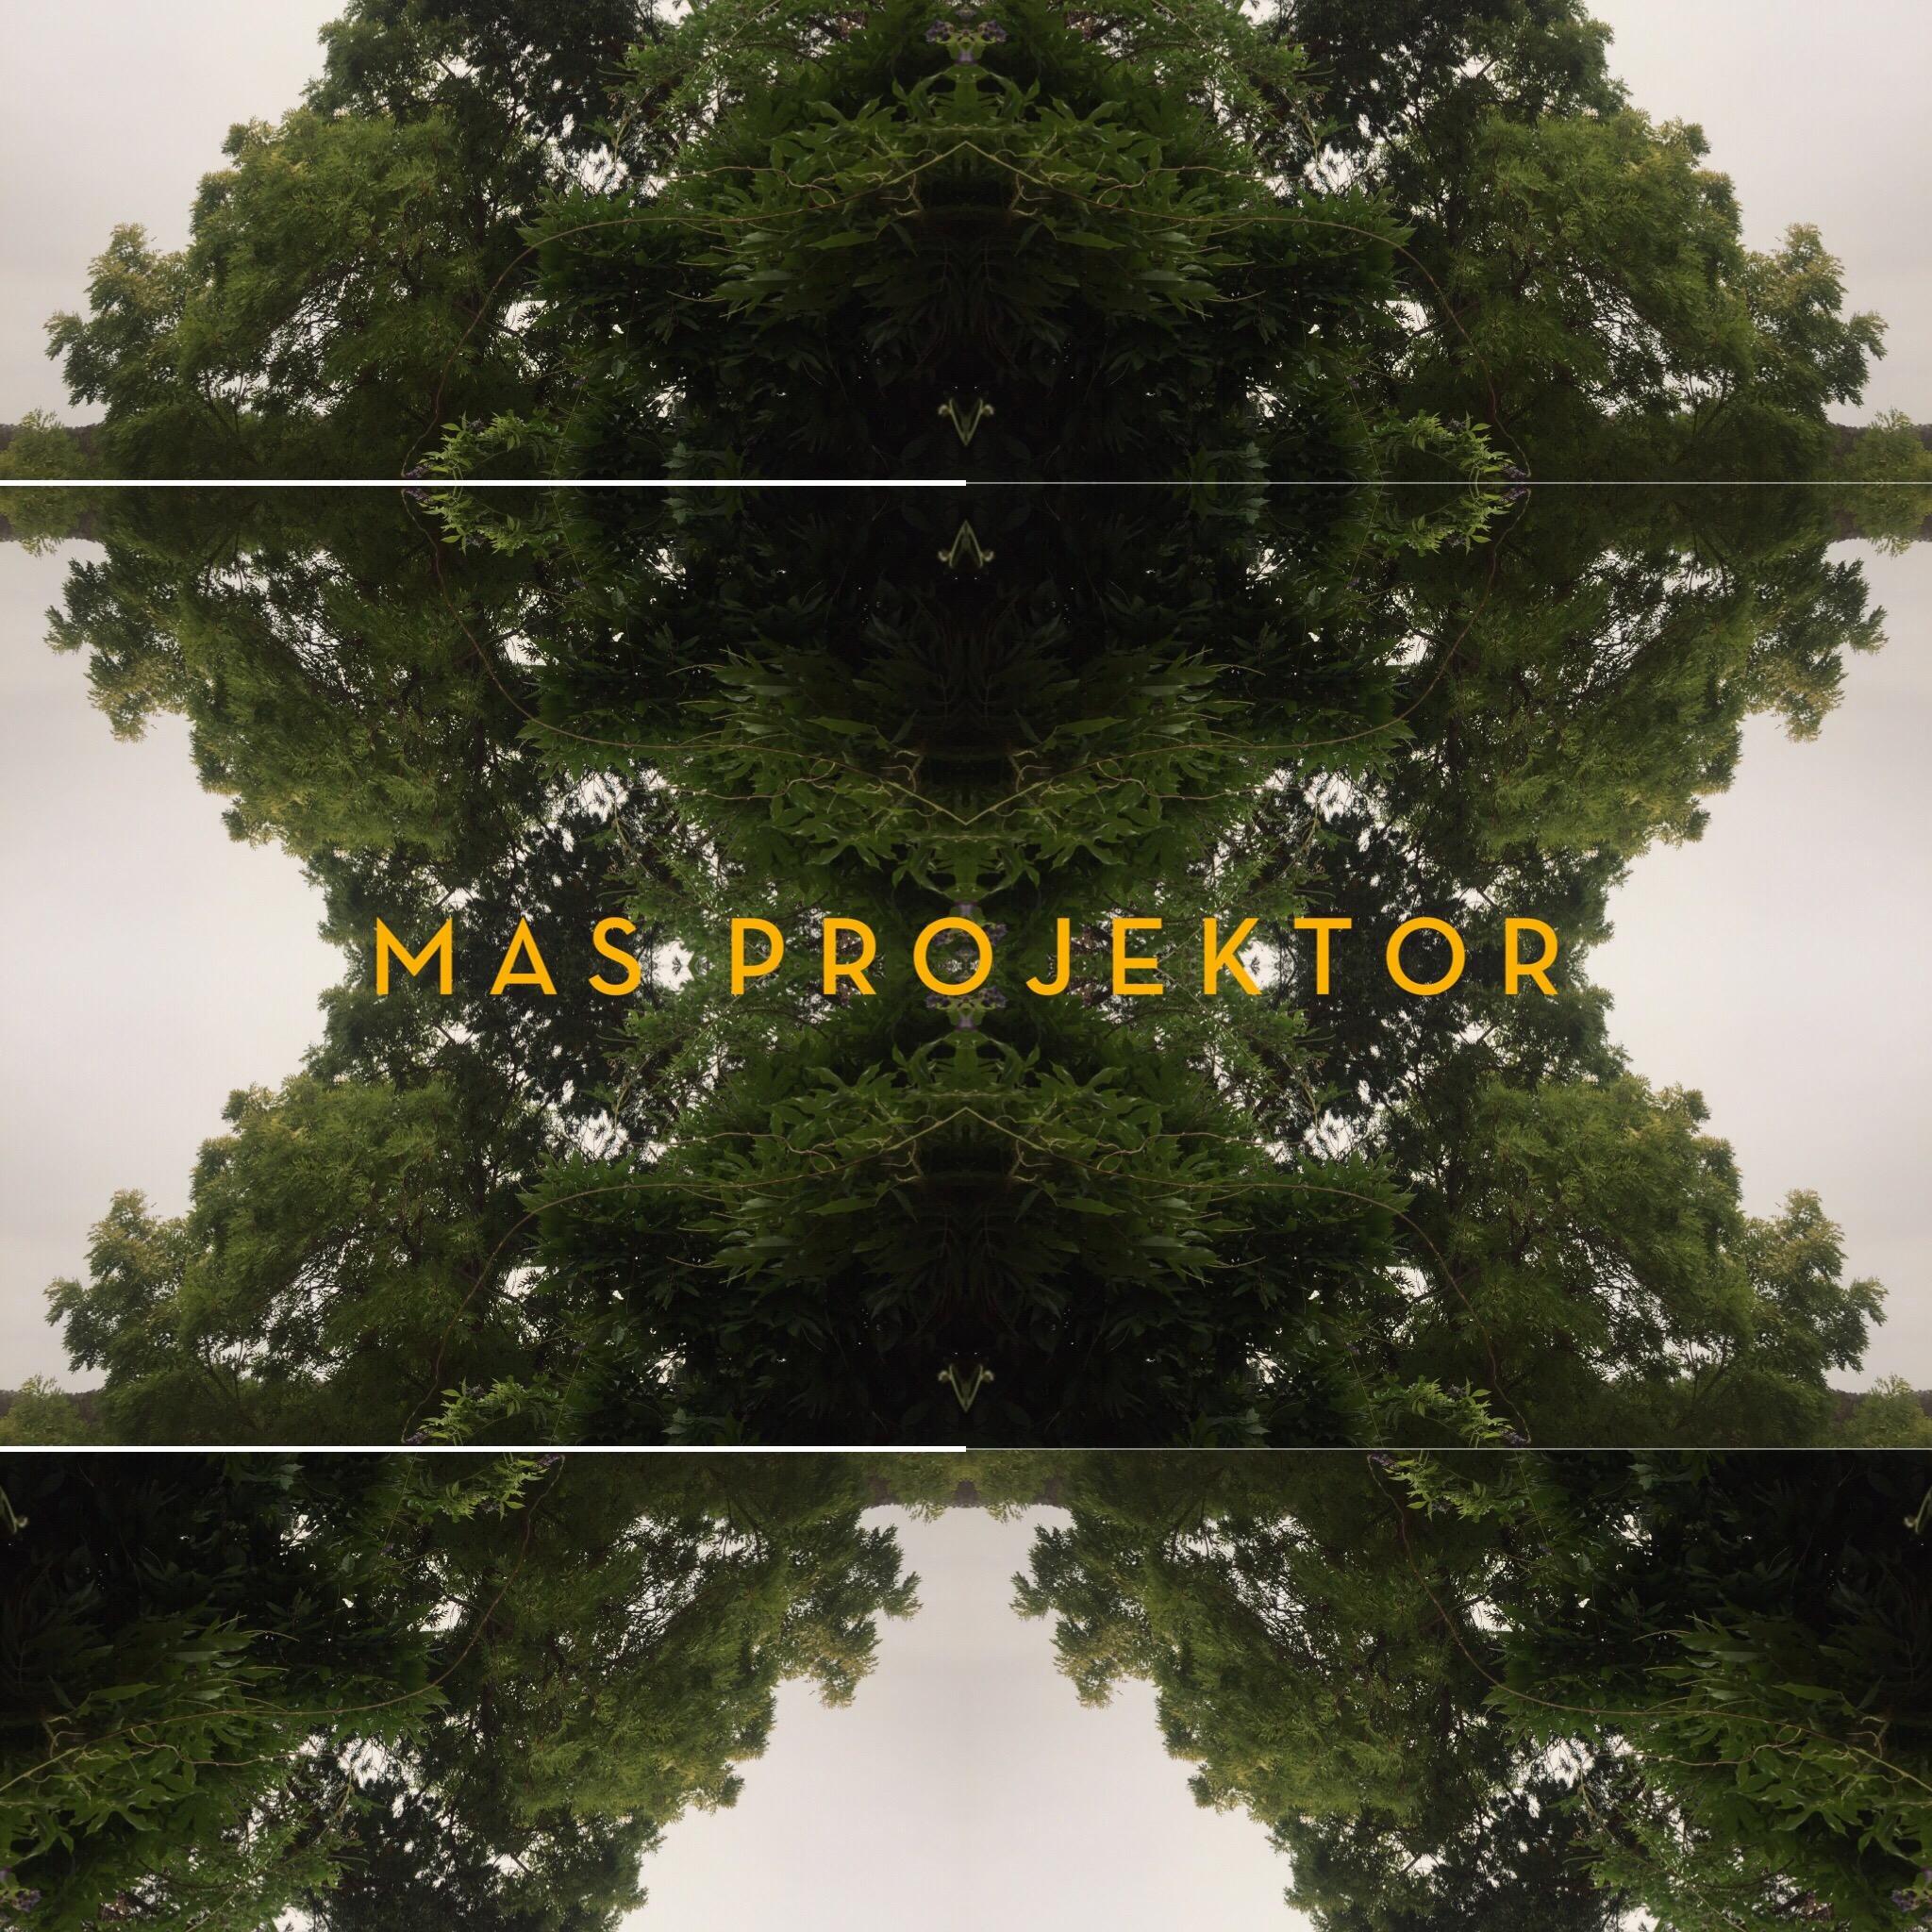 Mas Projektor - Future Magnetic  - Liveset 1 (2020)